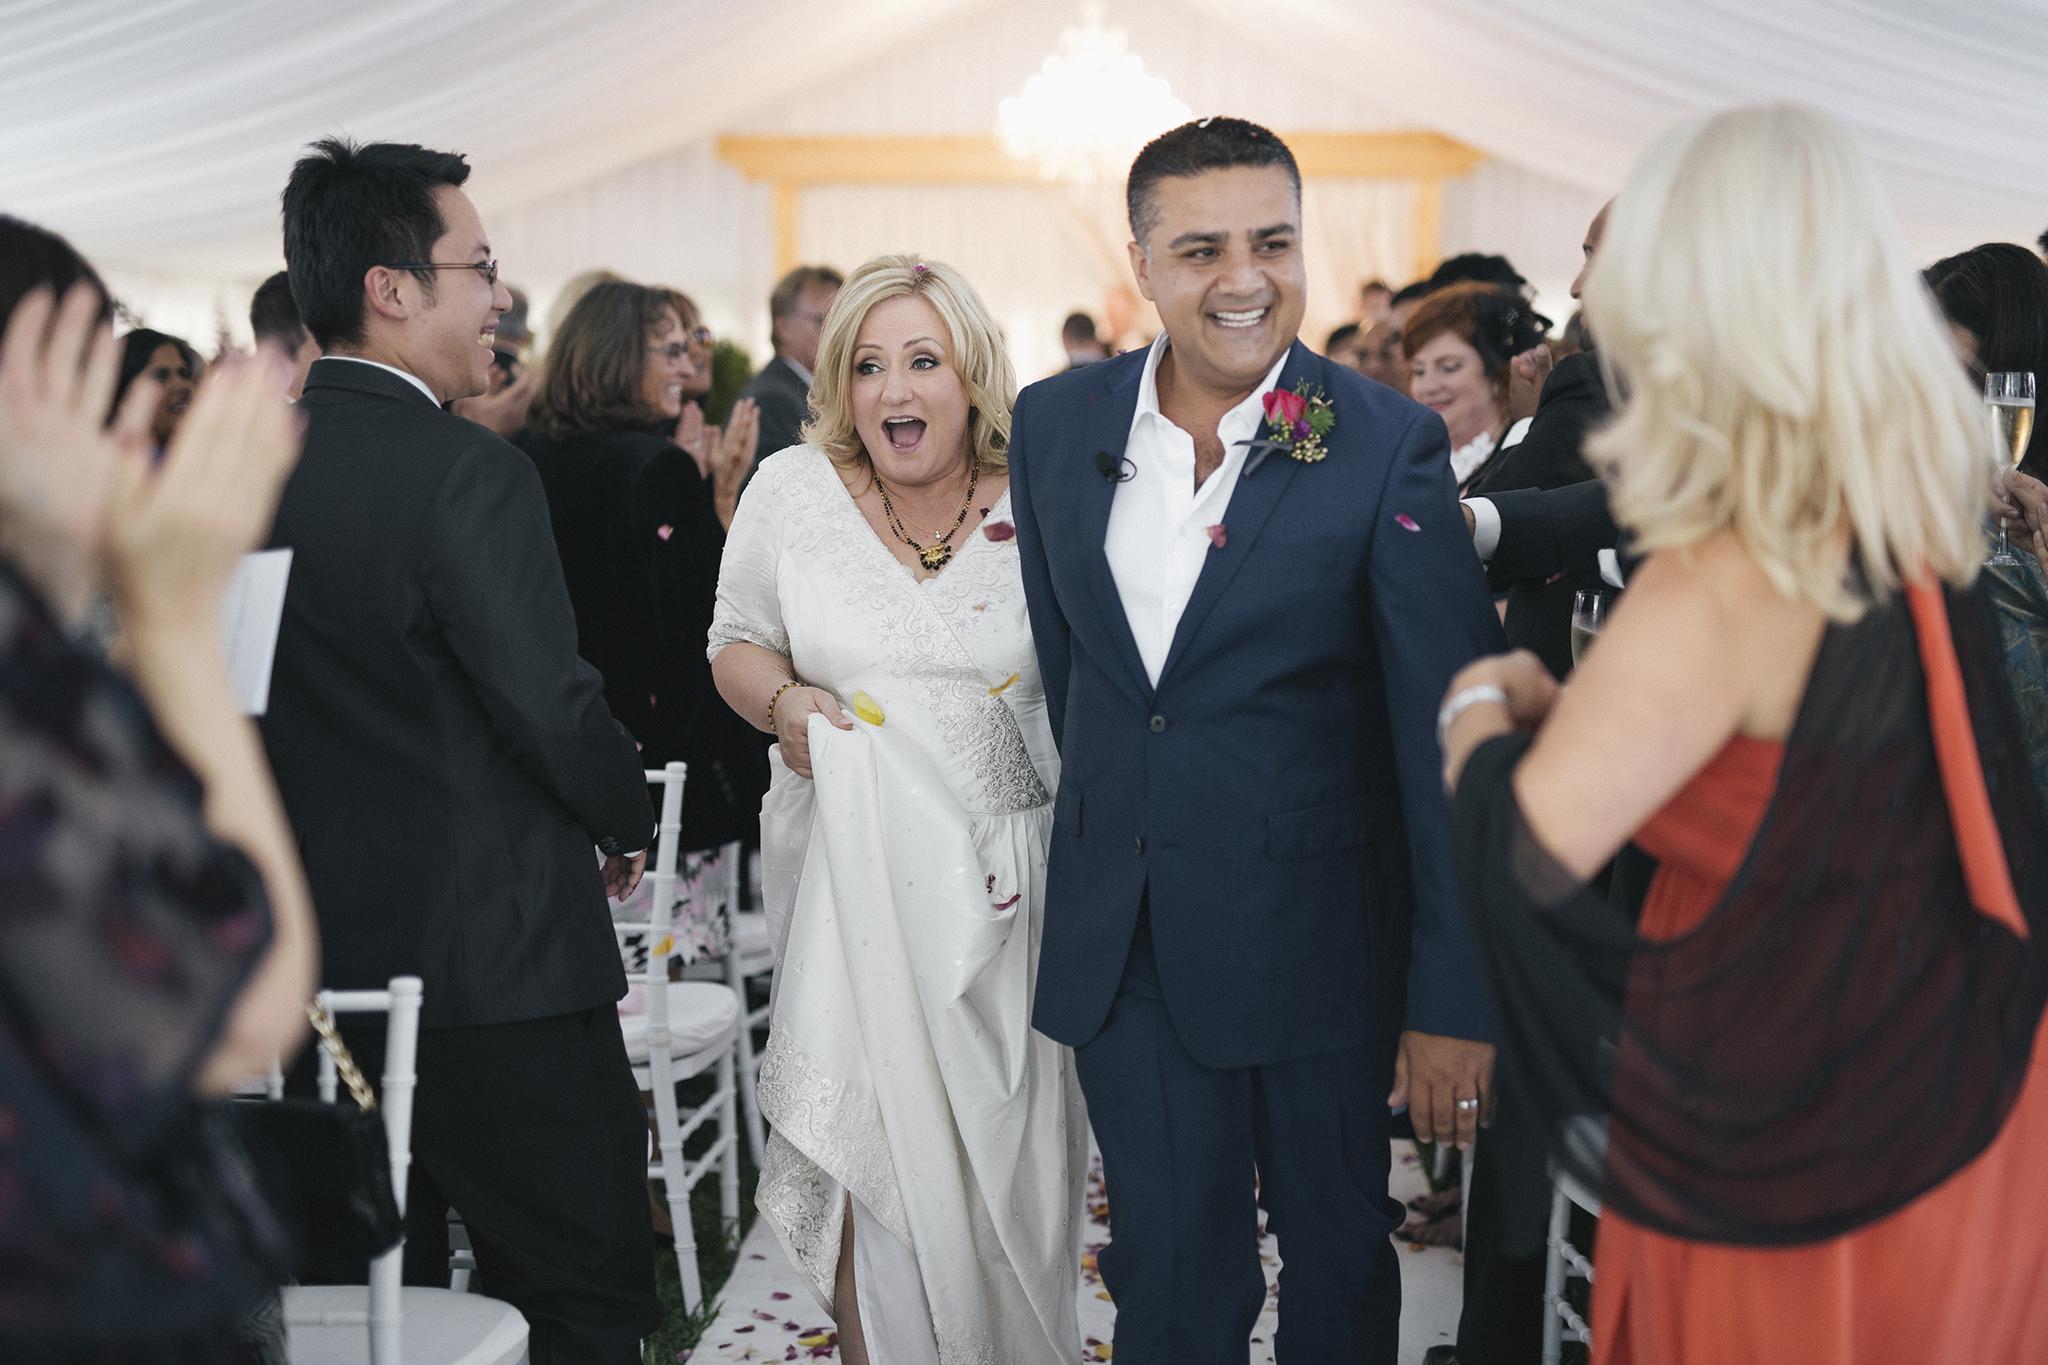 Neil and Bev Wedding Day 183.jpg